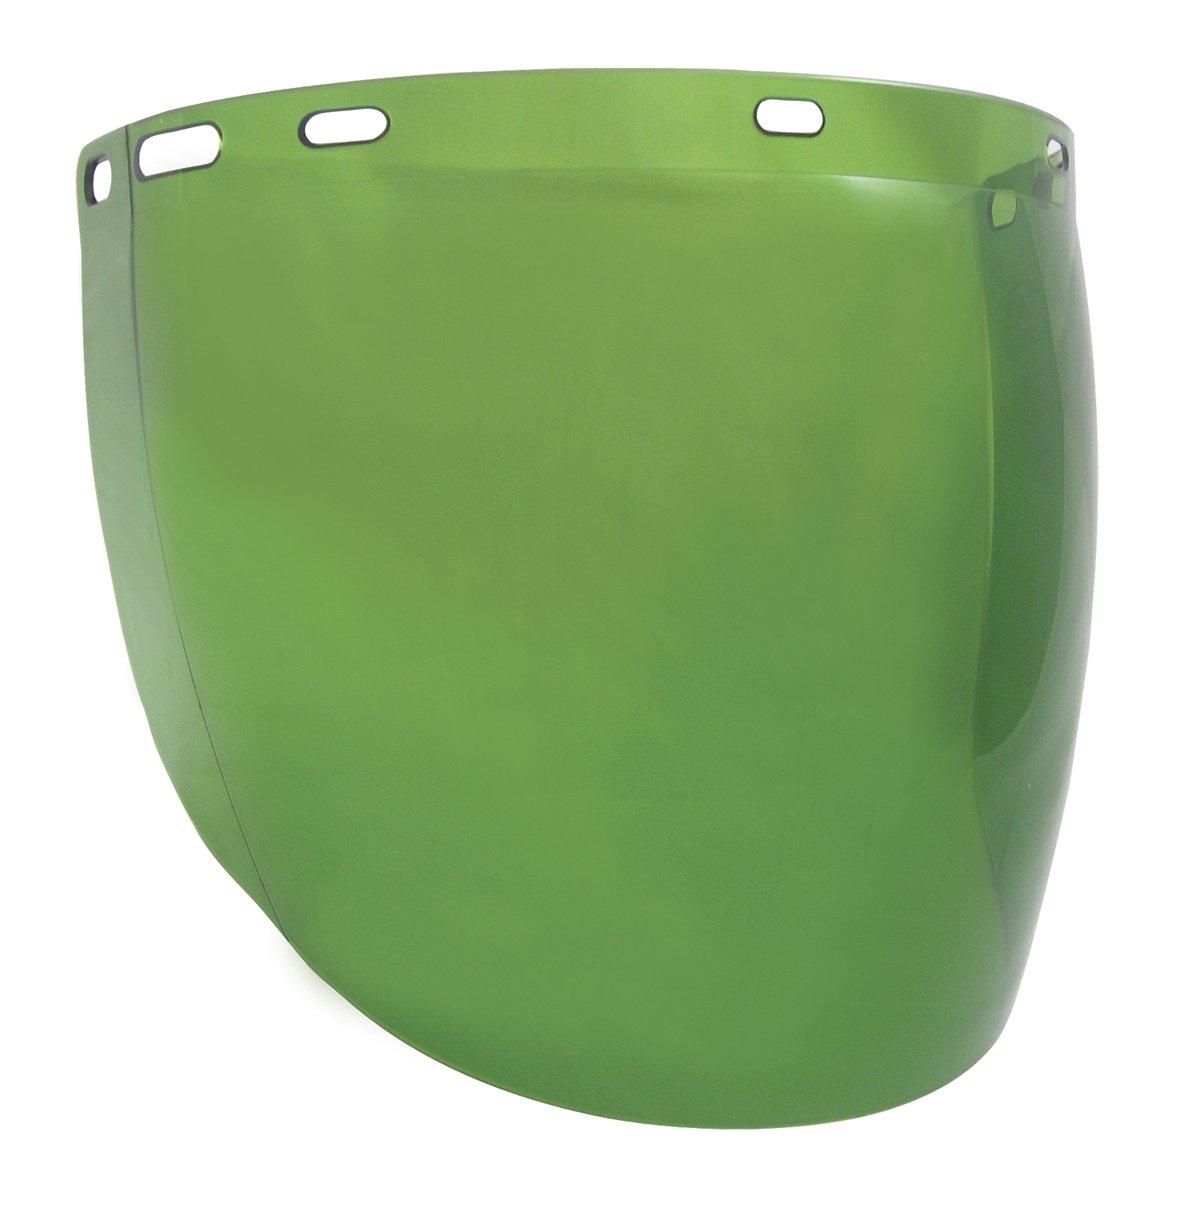 SAS Safety 5157 Replacement Faceshield for 5147, Dark Green